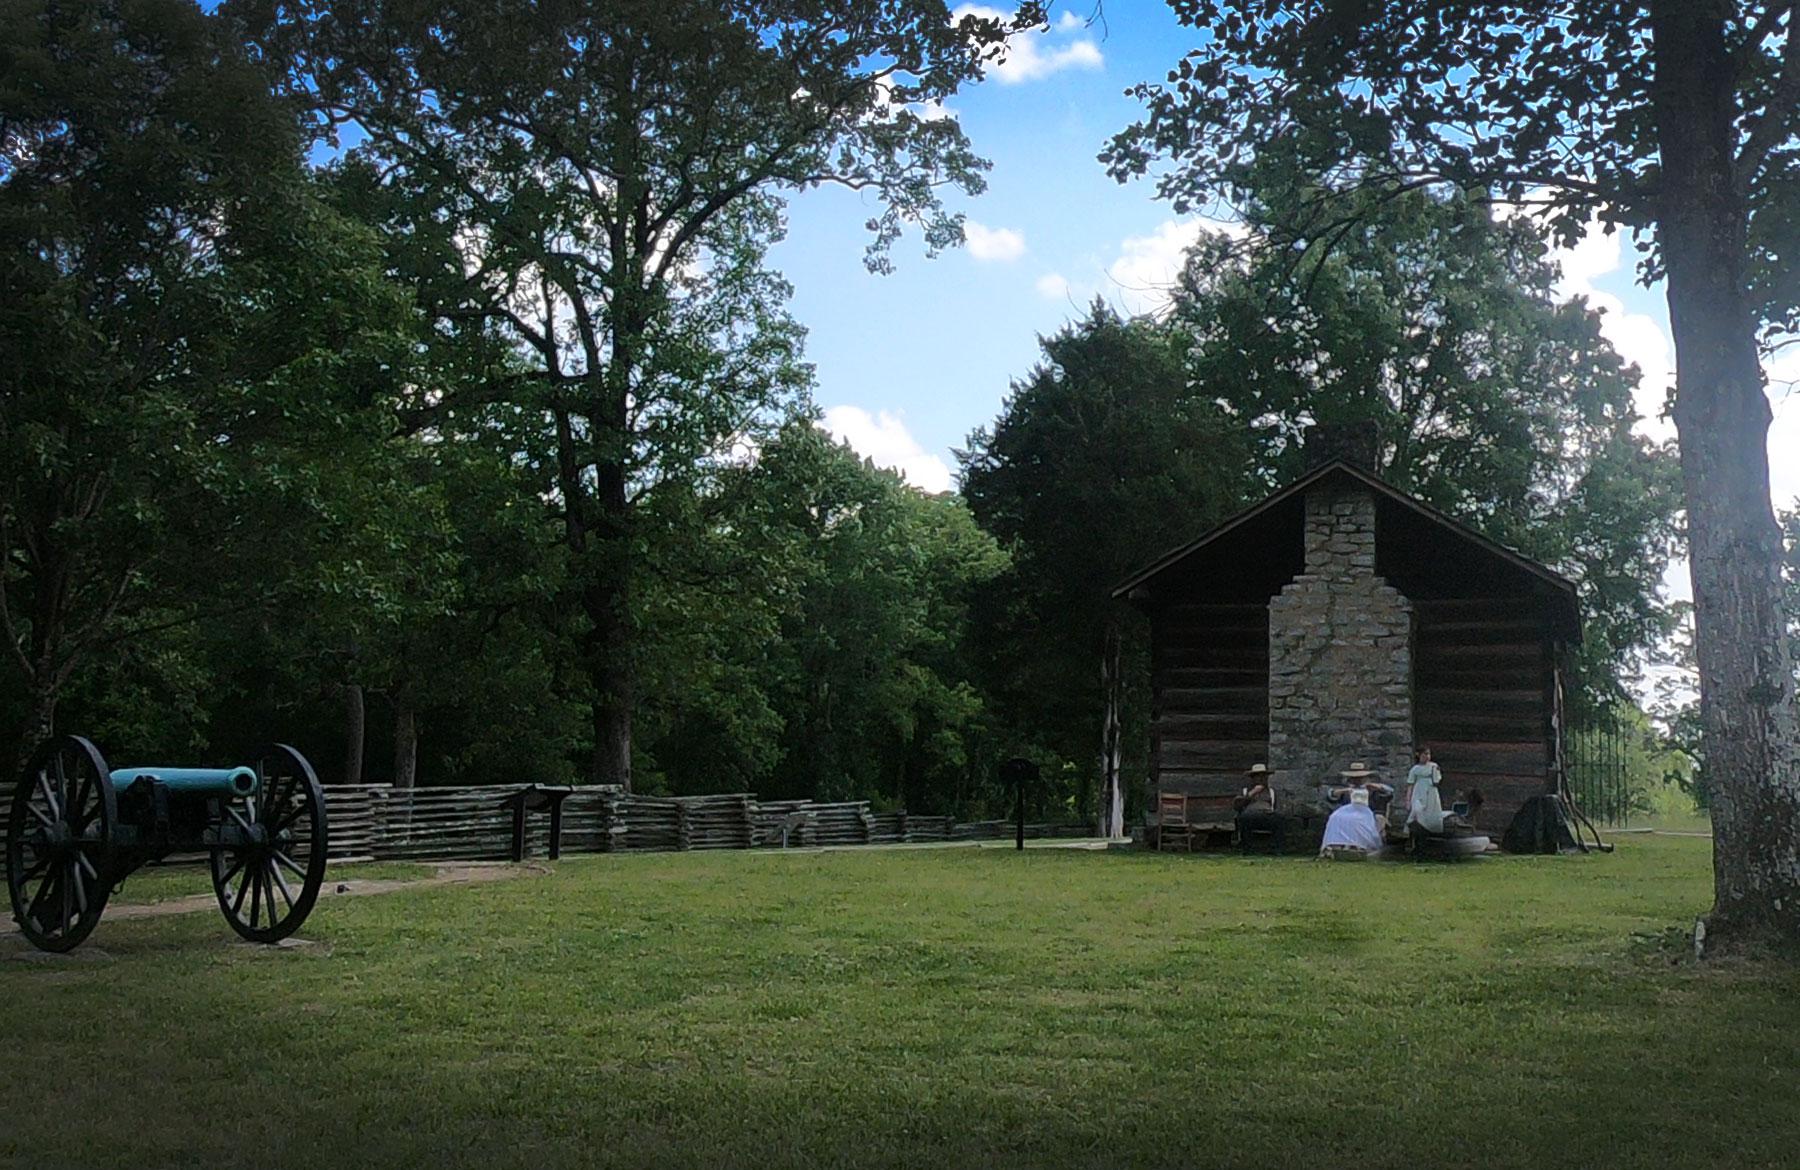 Living history program outside the Brotherton Cabin at Monument at Chickamauga and Chattanooga National Military Park, Georgia